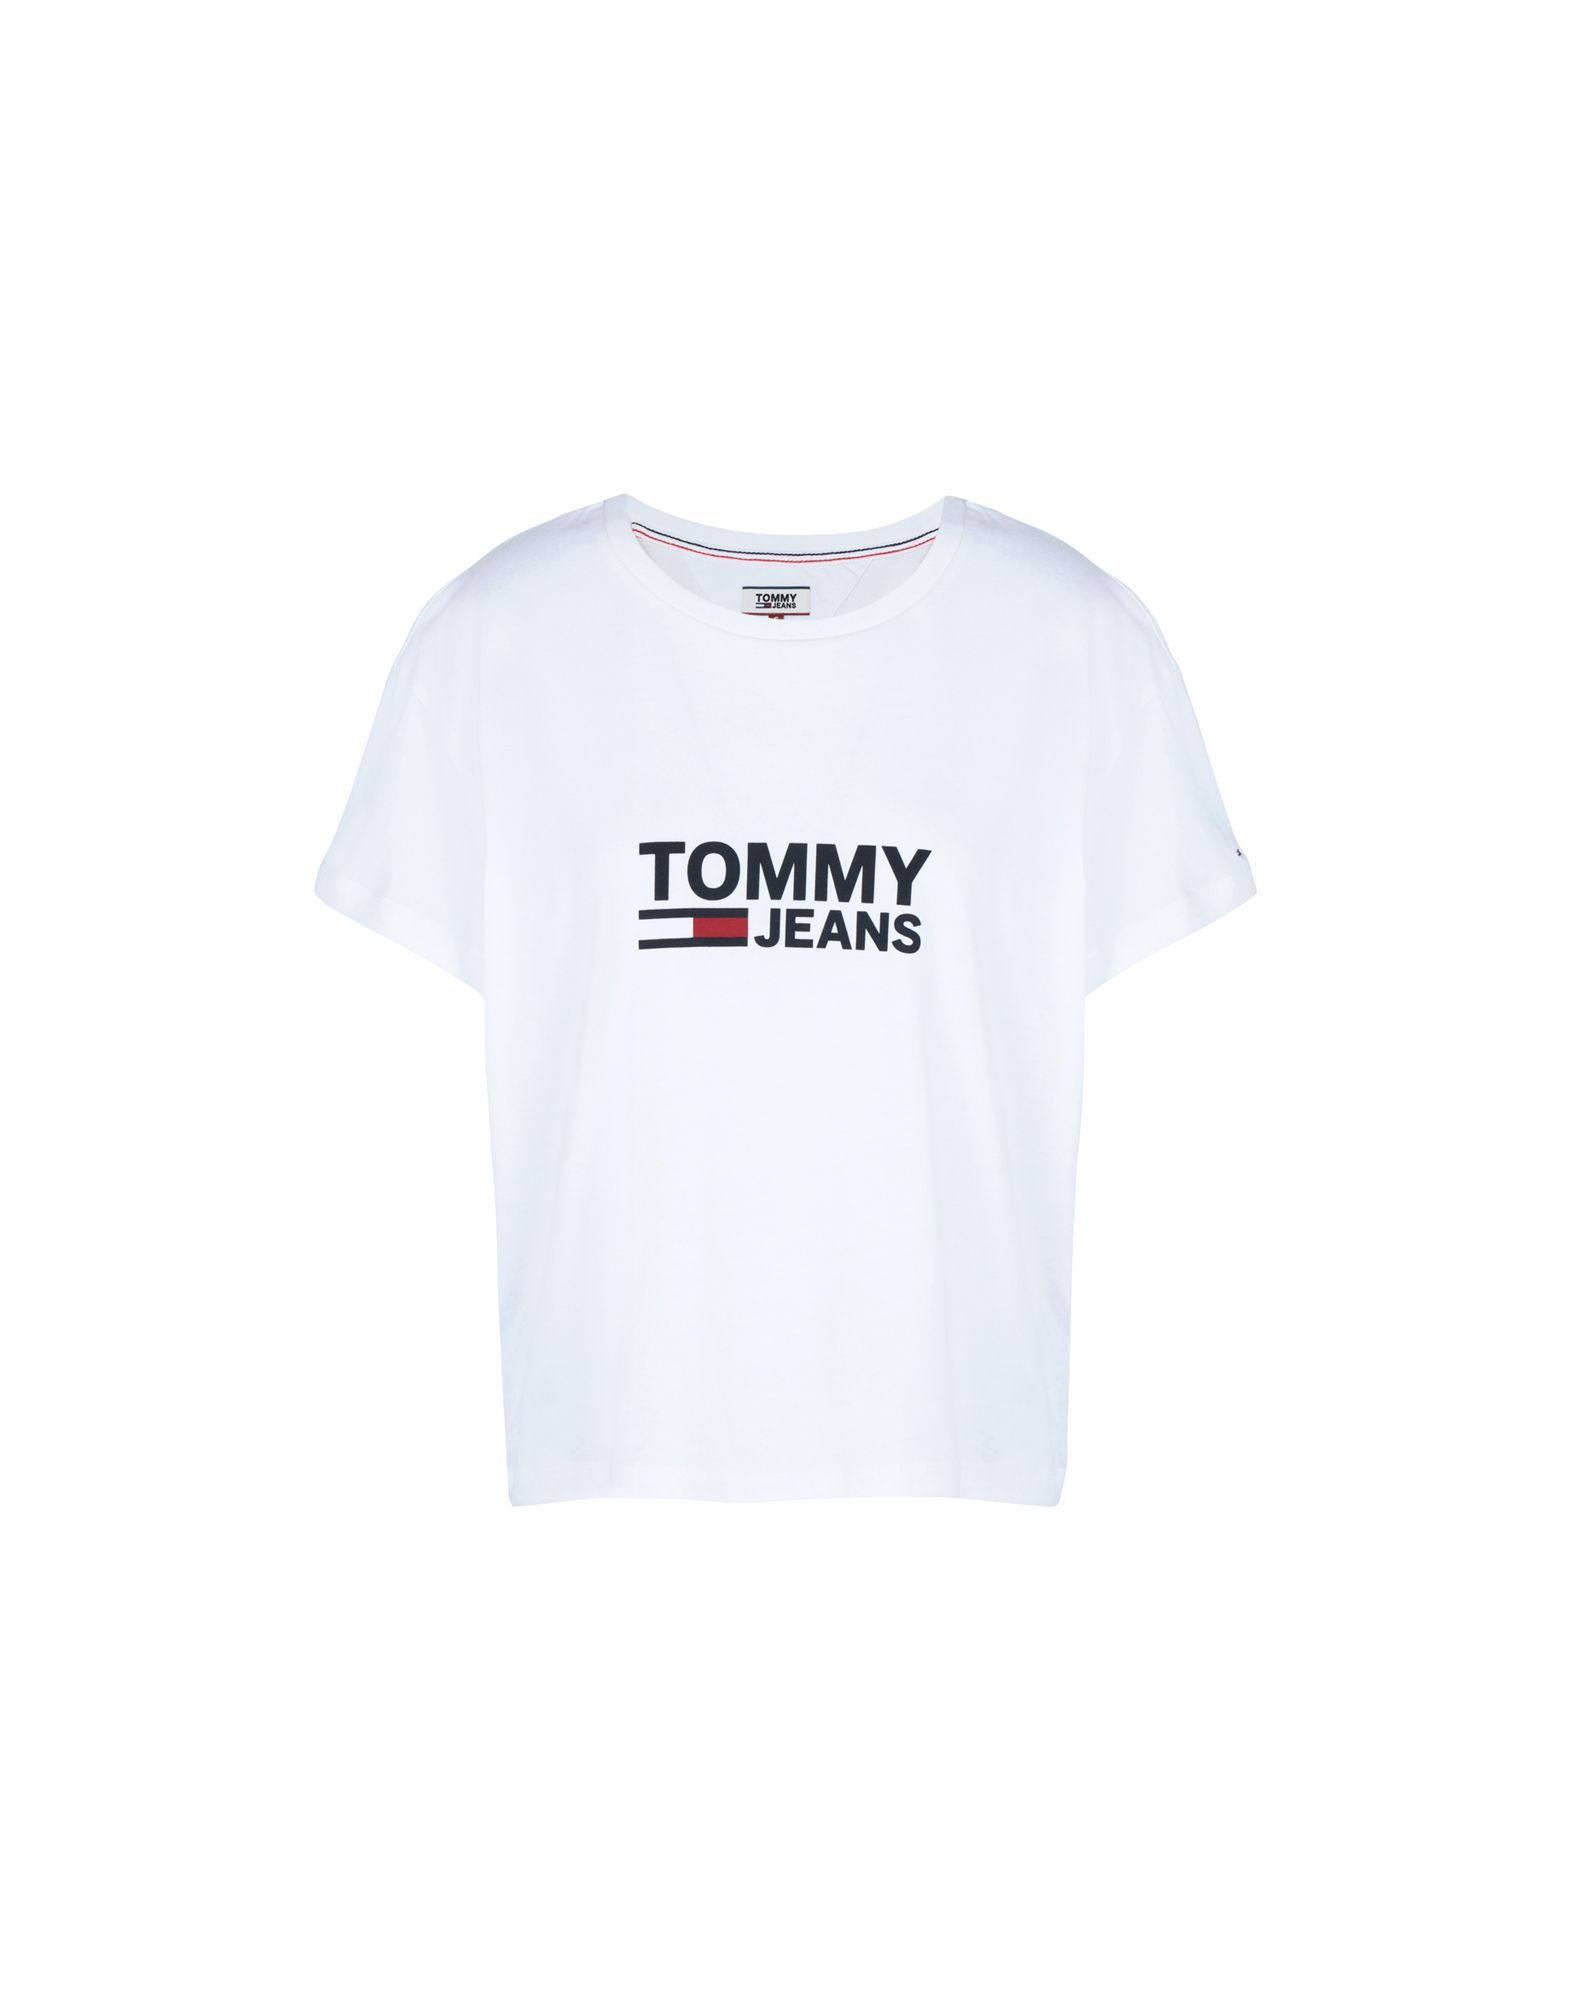 TOMMY JEANS Футболка футболка tommy jeans dw0dw03984 038 lt grey htr